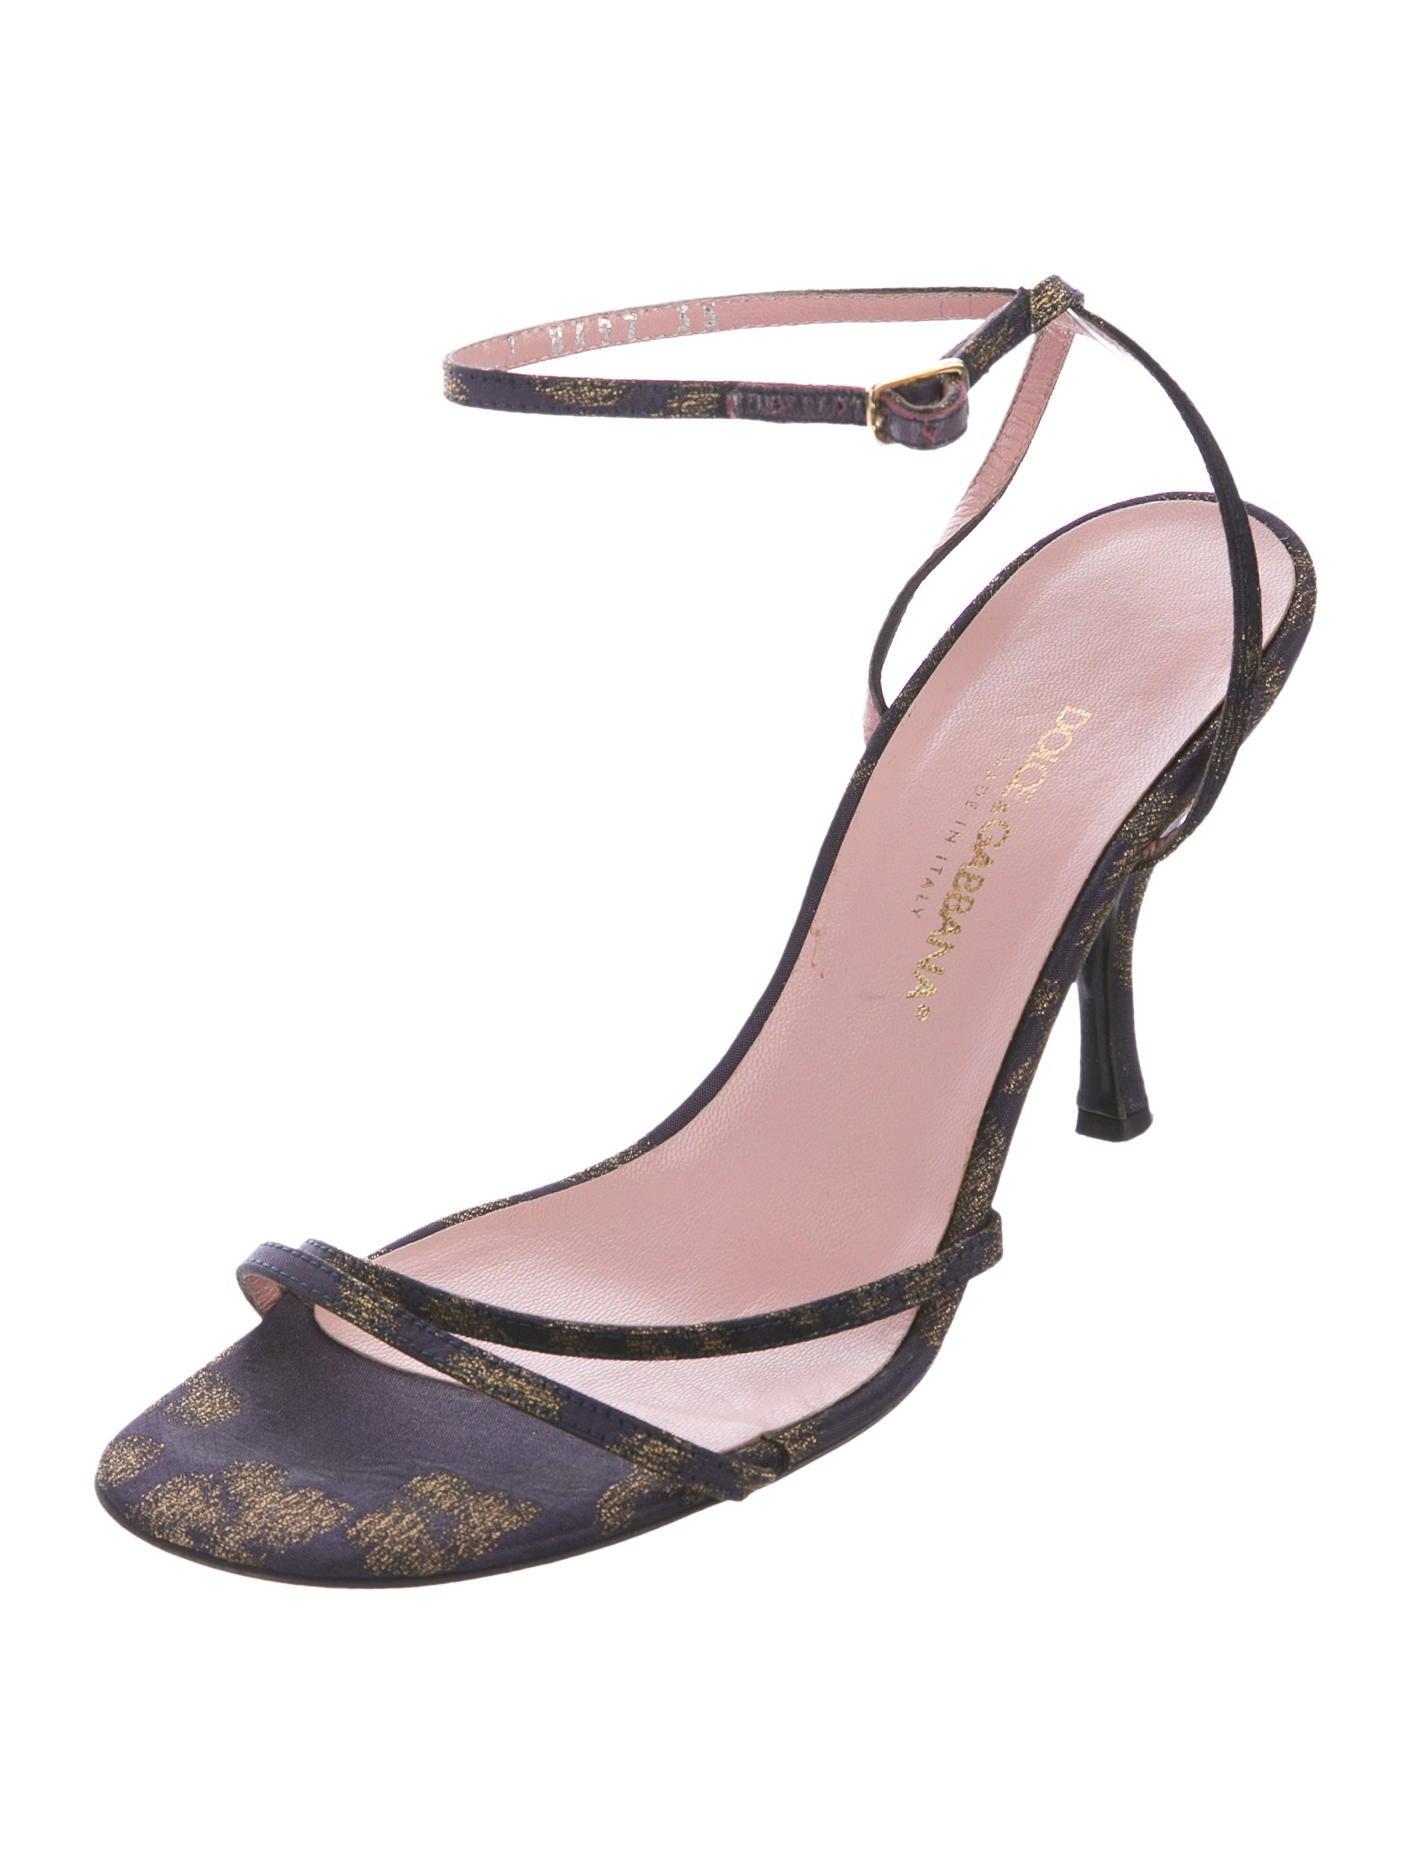 7082427c47c6 Dolce   Gabbana Satin Wrap-Around Sandals - Shoes - DAG95026